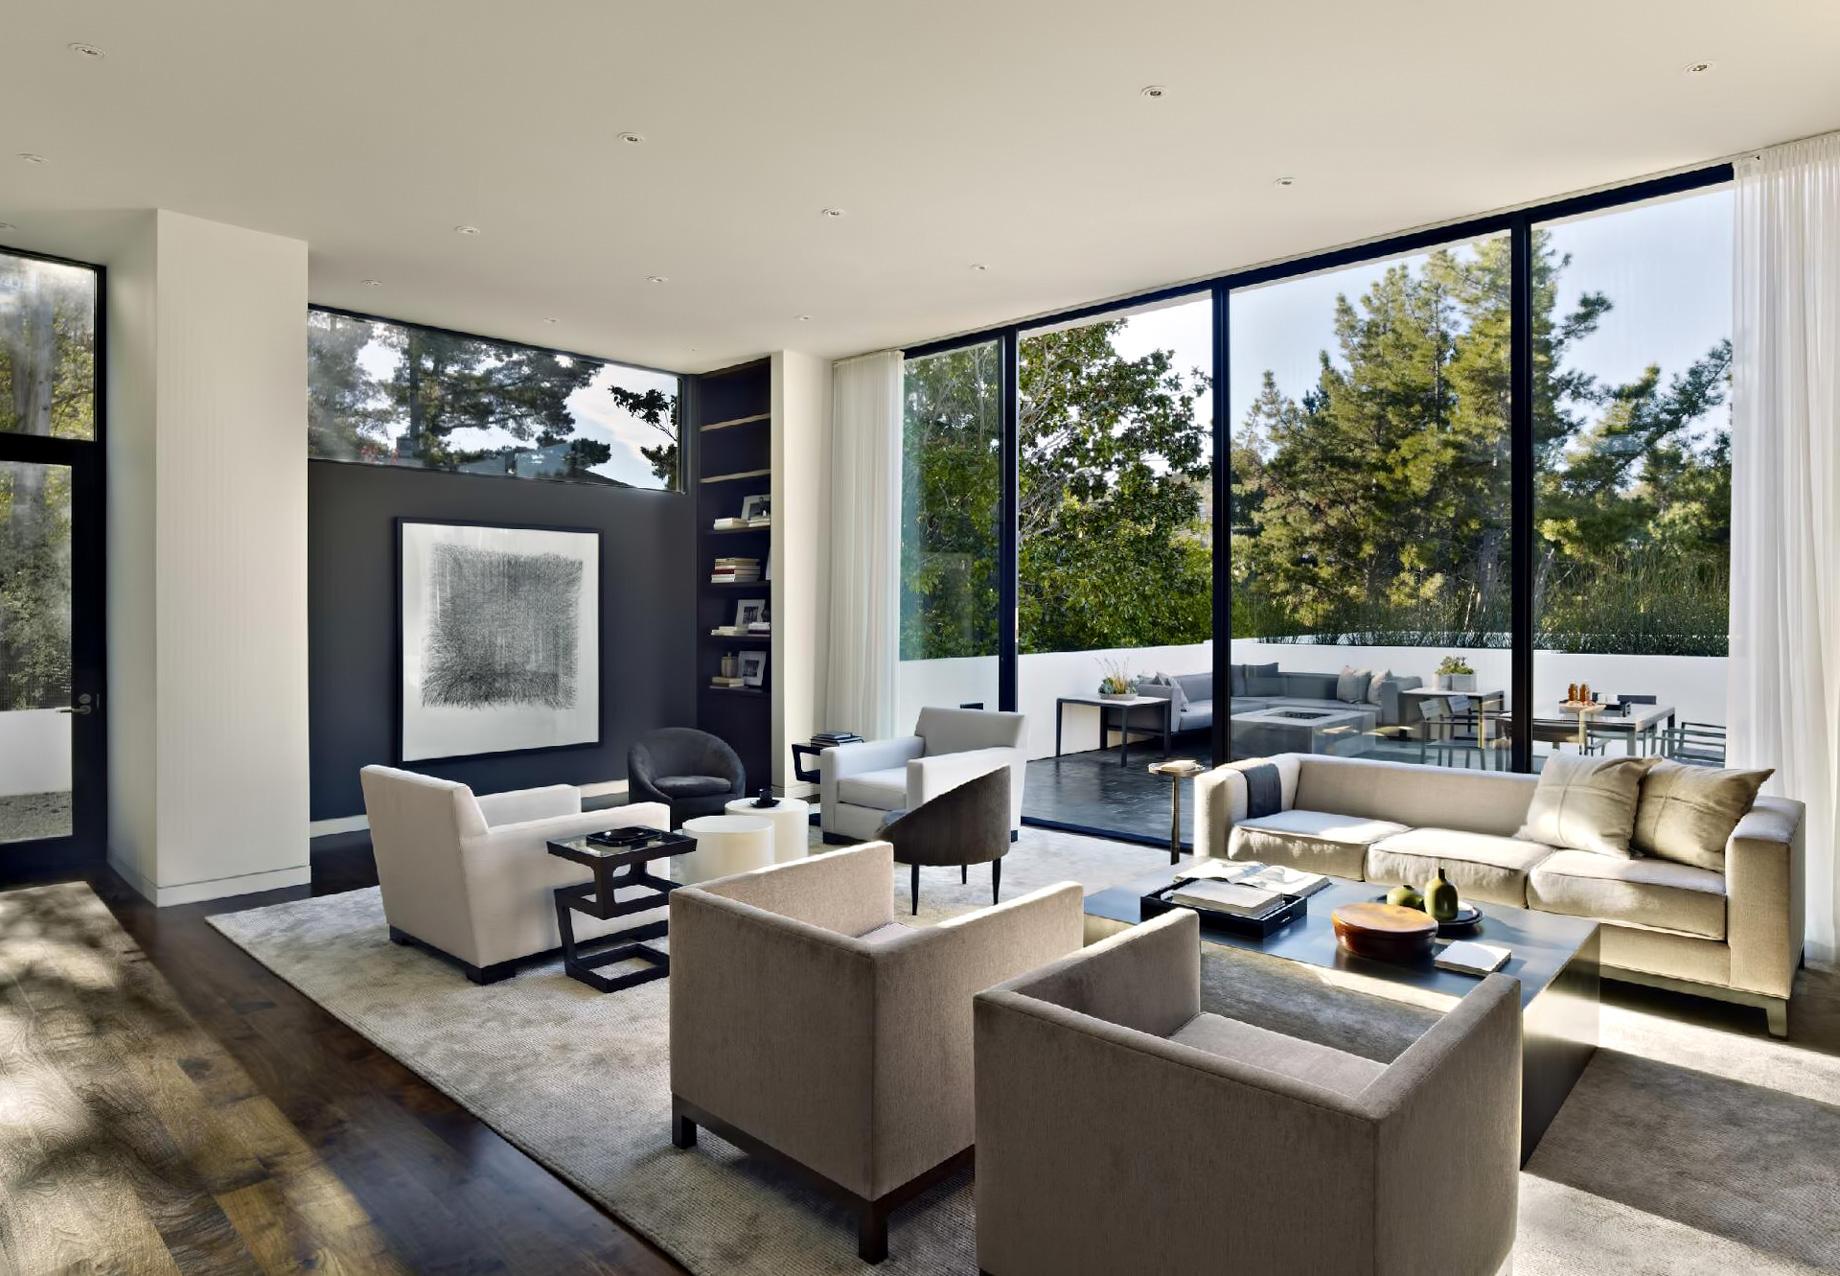 Drayton House Luxury Residence – Hillsborough, CA, USA